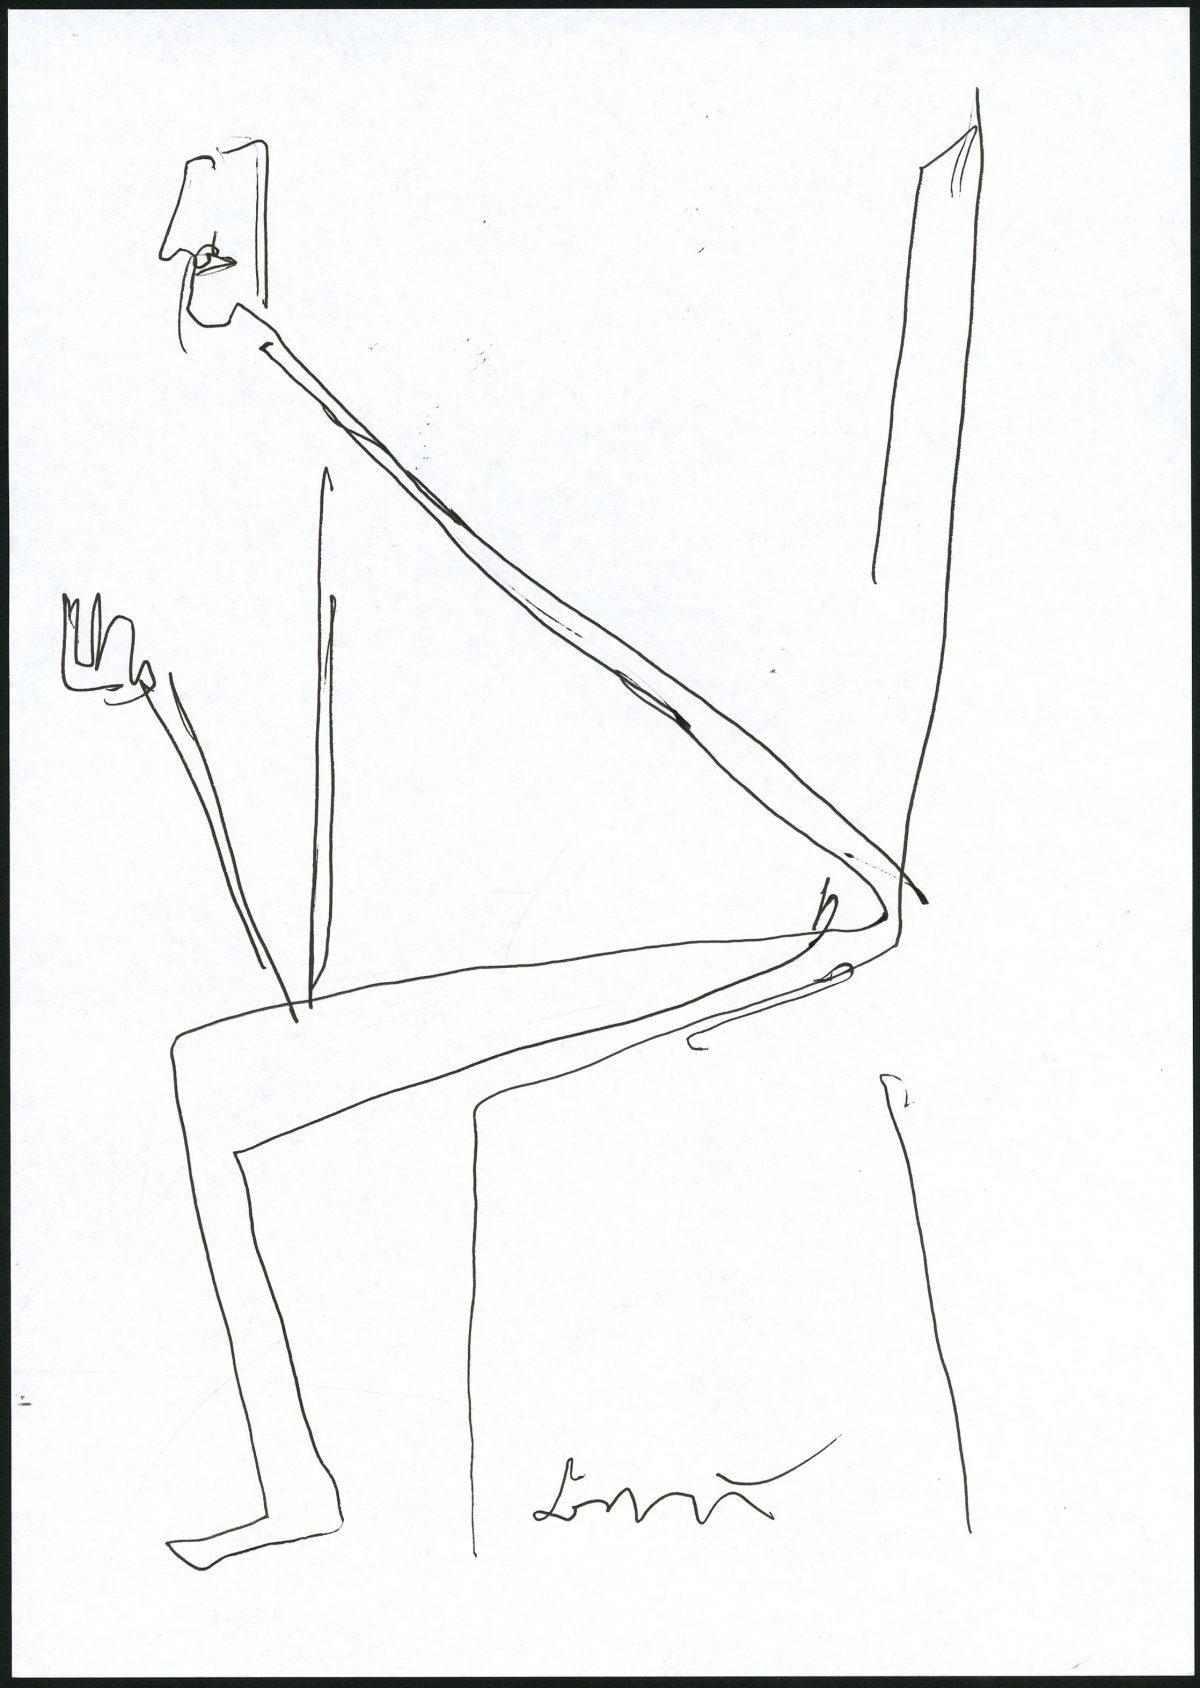 G26987(102)<br/> <b>Cím:</b> Kissé szeszélyesek <br/> <b>Méret cm:</b> 29,8x21 <br/> <b>Készült:</b> 2007. <br/> <b>Technika:</b> toll<br/>